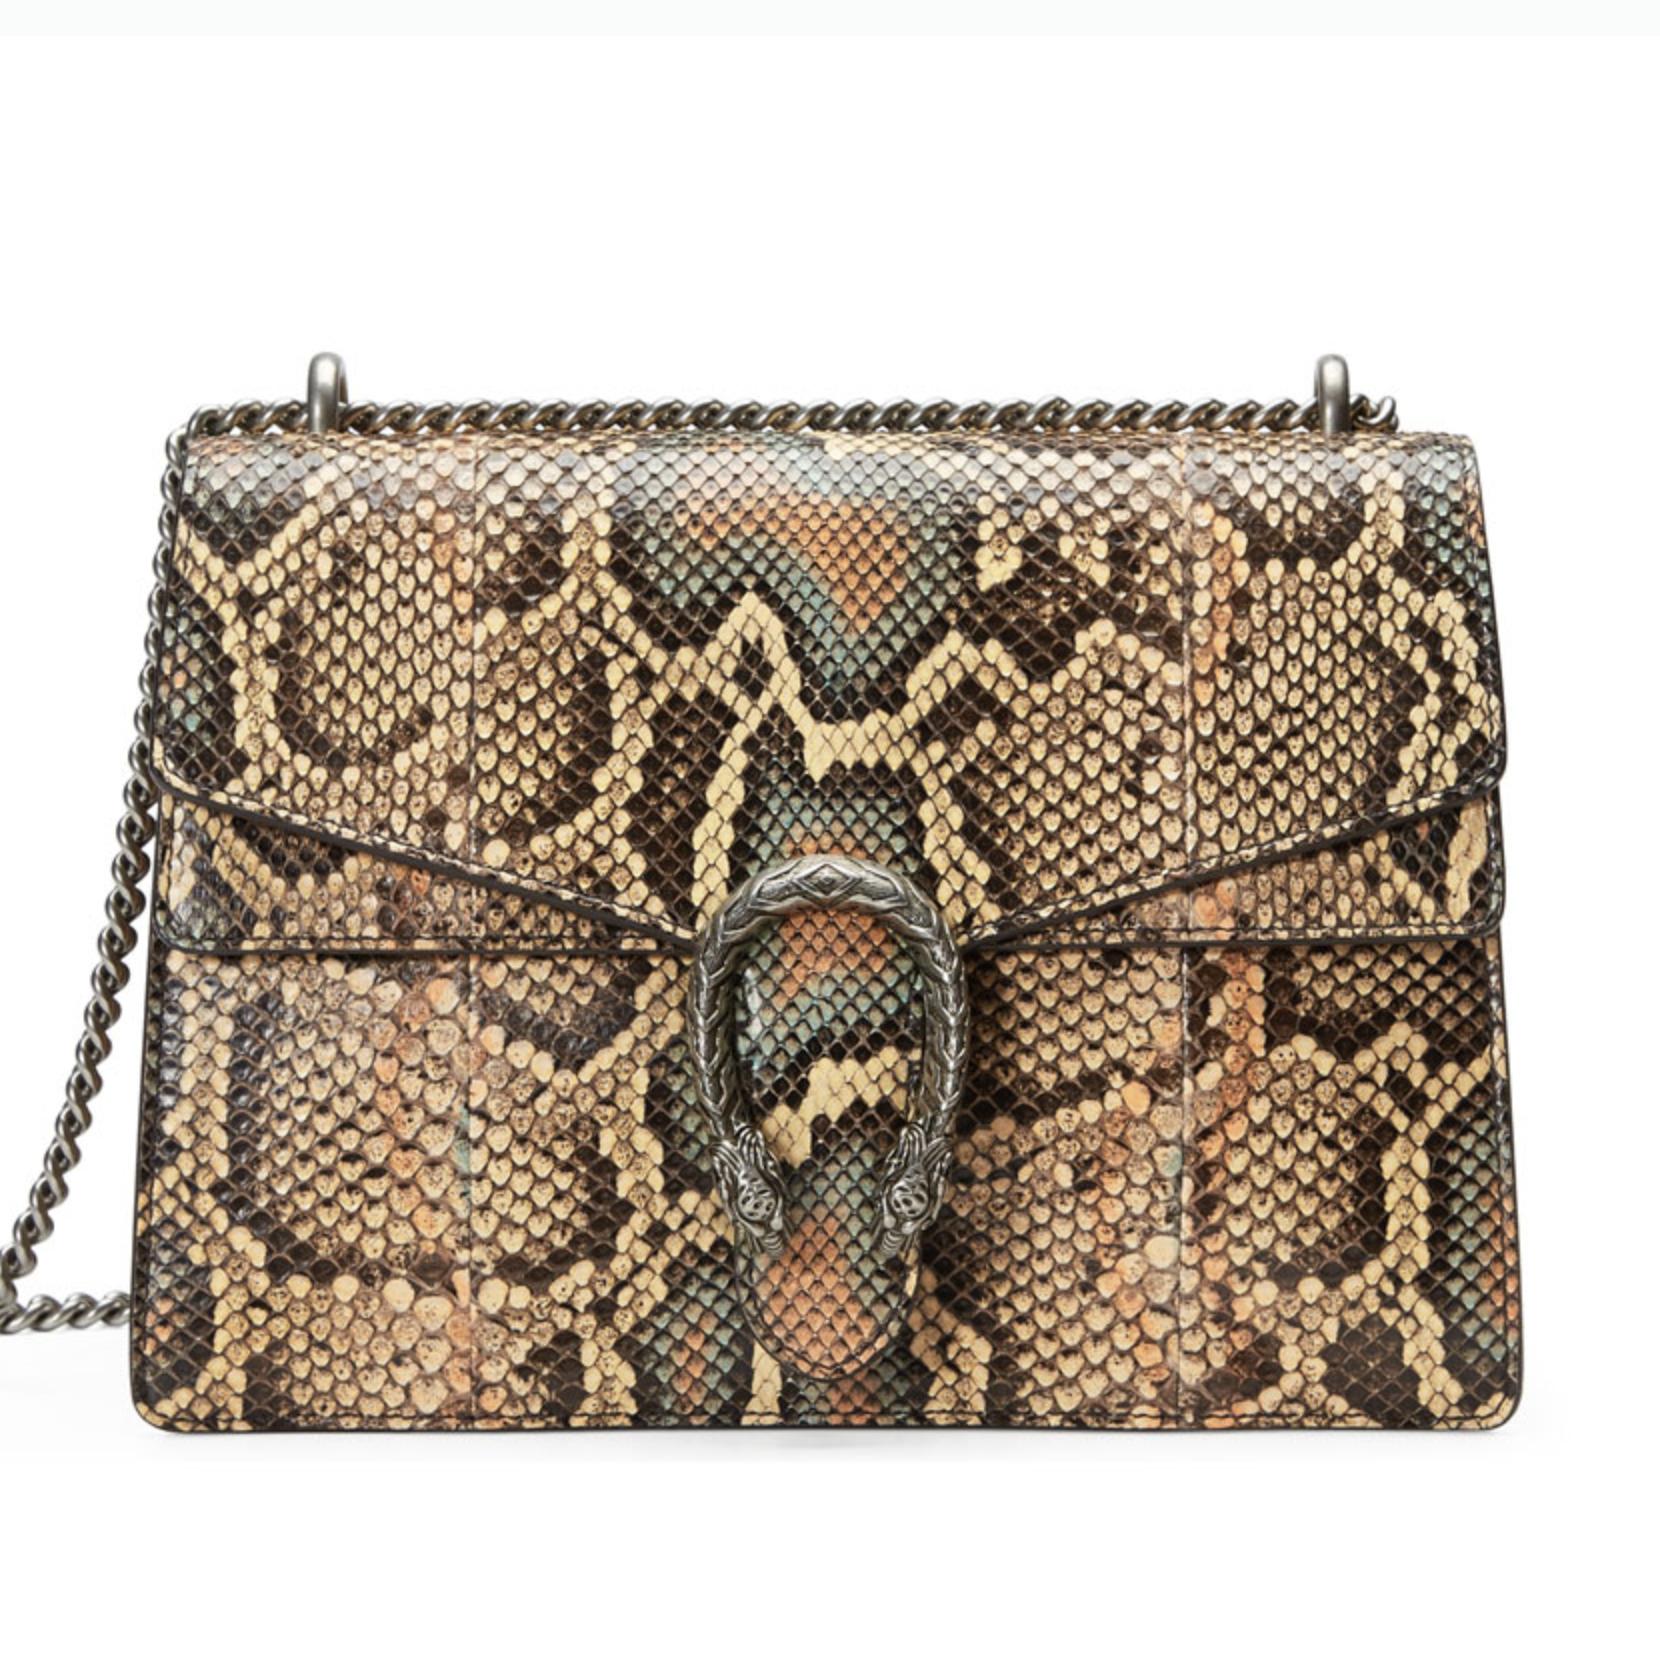 gucci dionysus python skin handbag